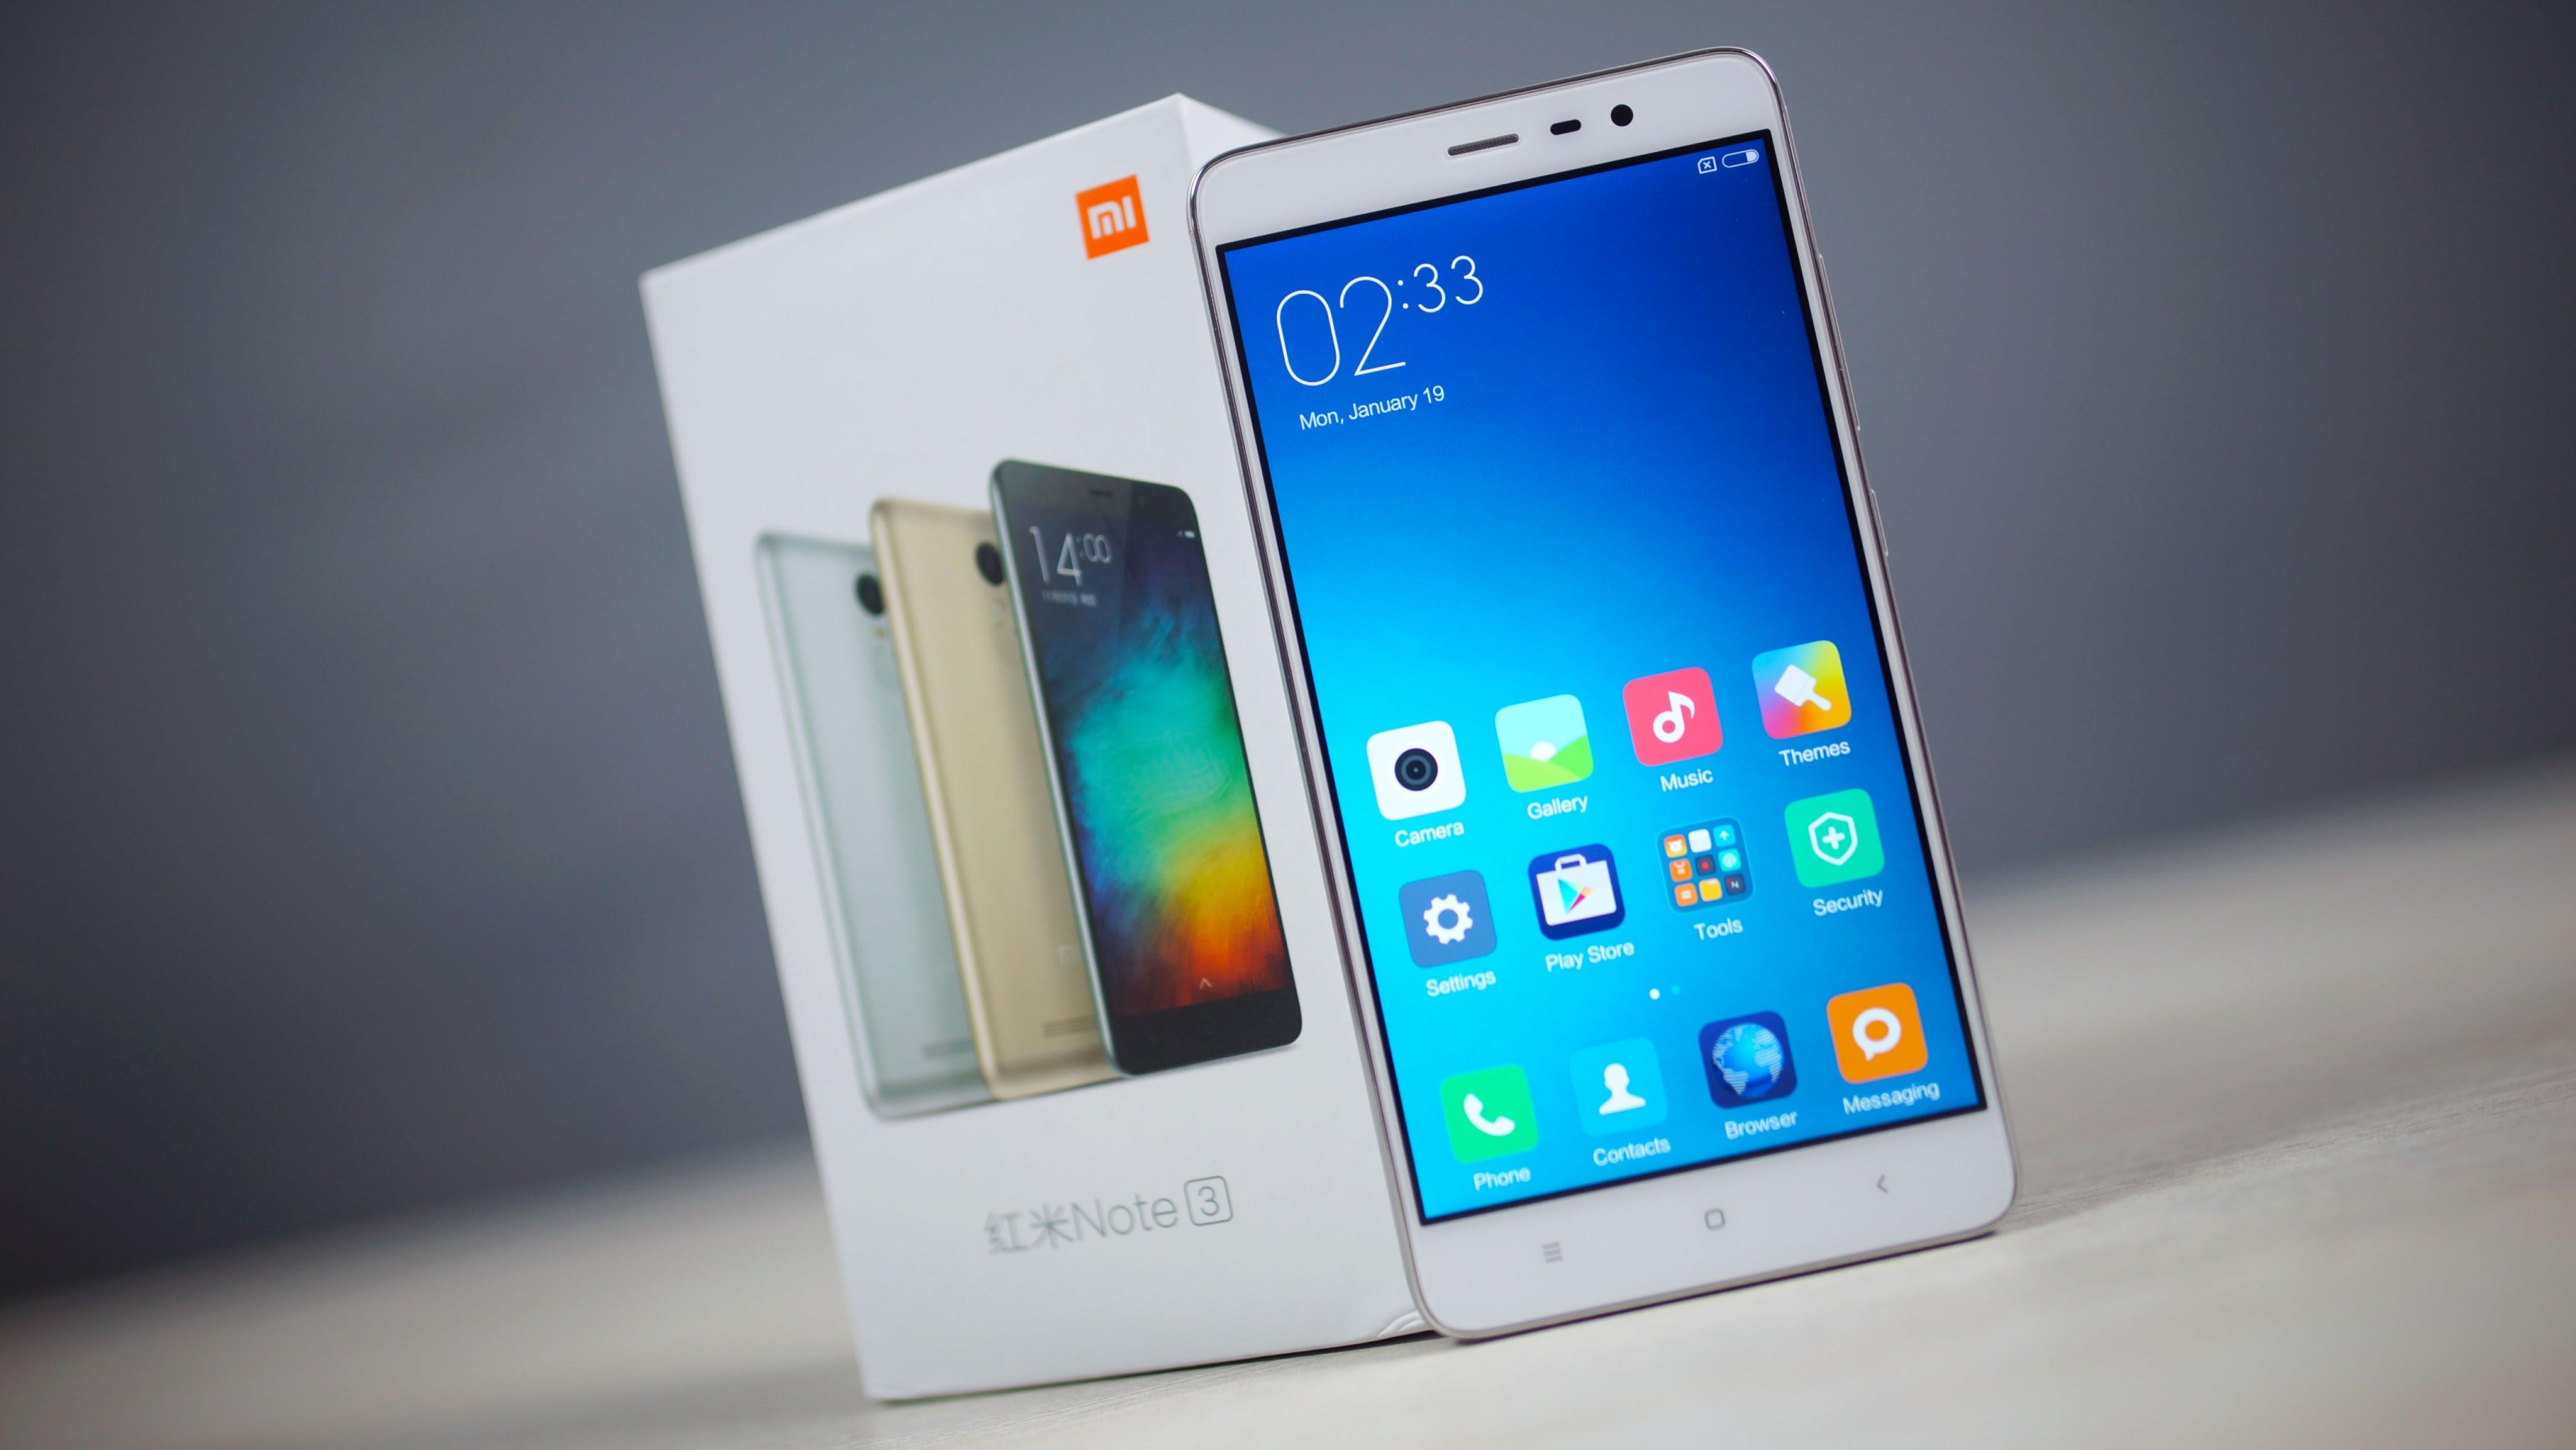 Offerte Smartphone Xiaomi Con Gearbest Sconti A Partire Da 142 05 Euro Macitynet It